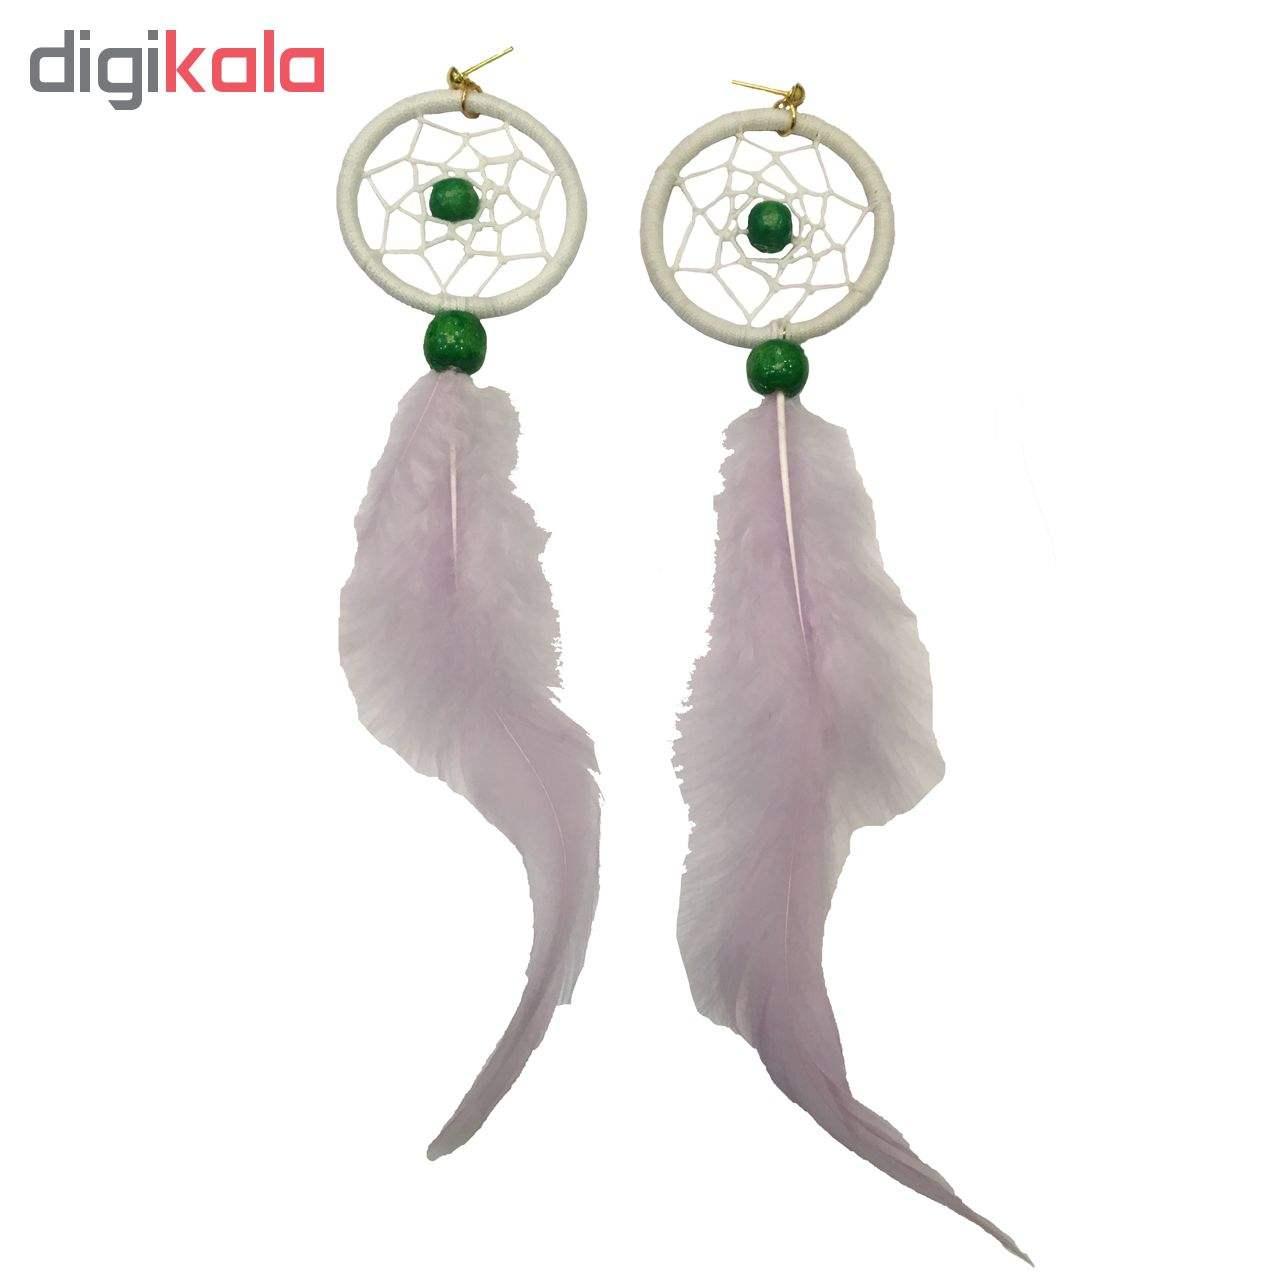 گوشواره زنانه طرح دریم کچر مدل SD 008 main 1 3